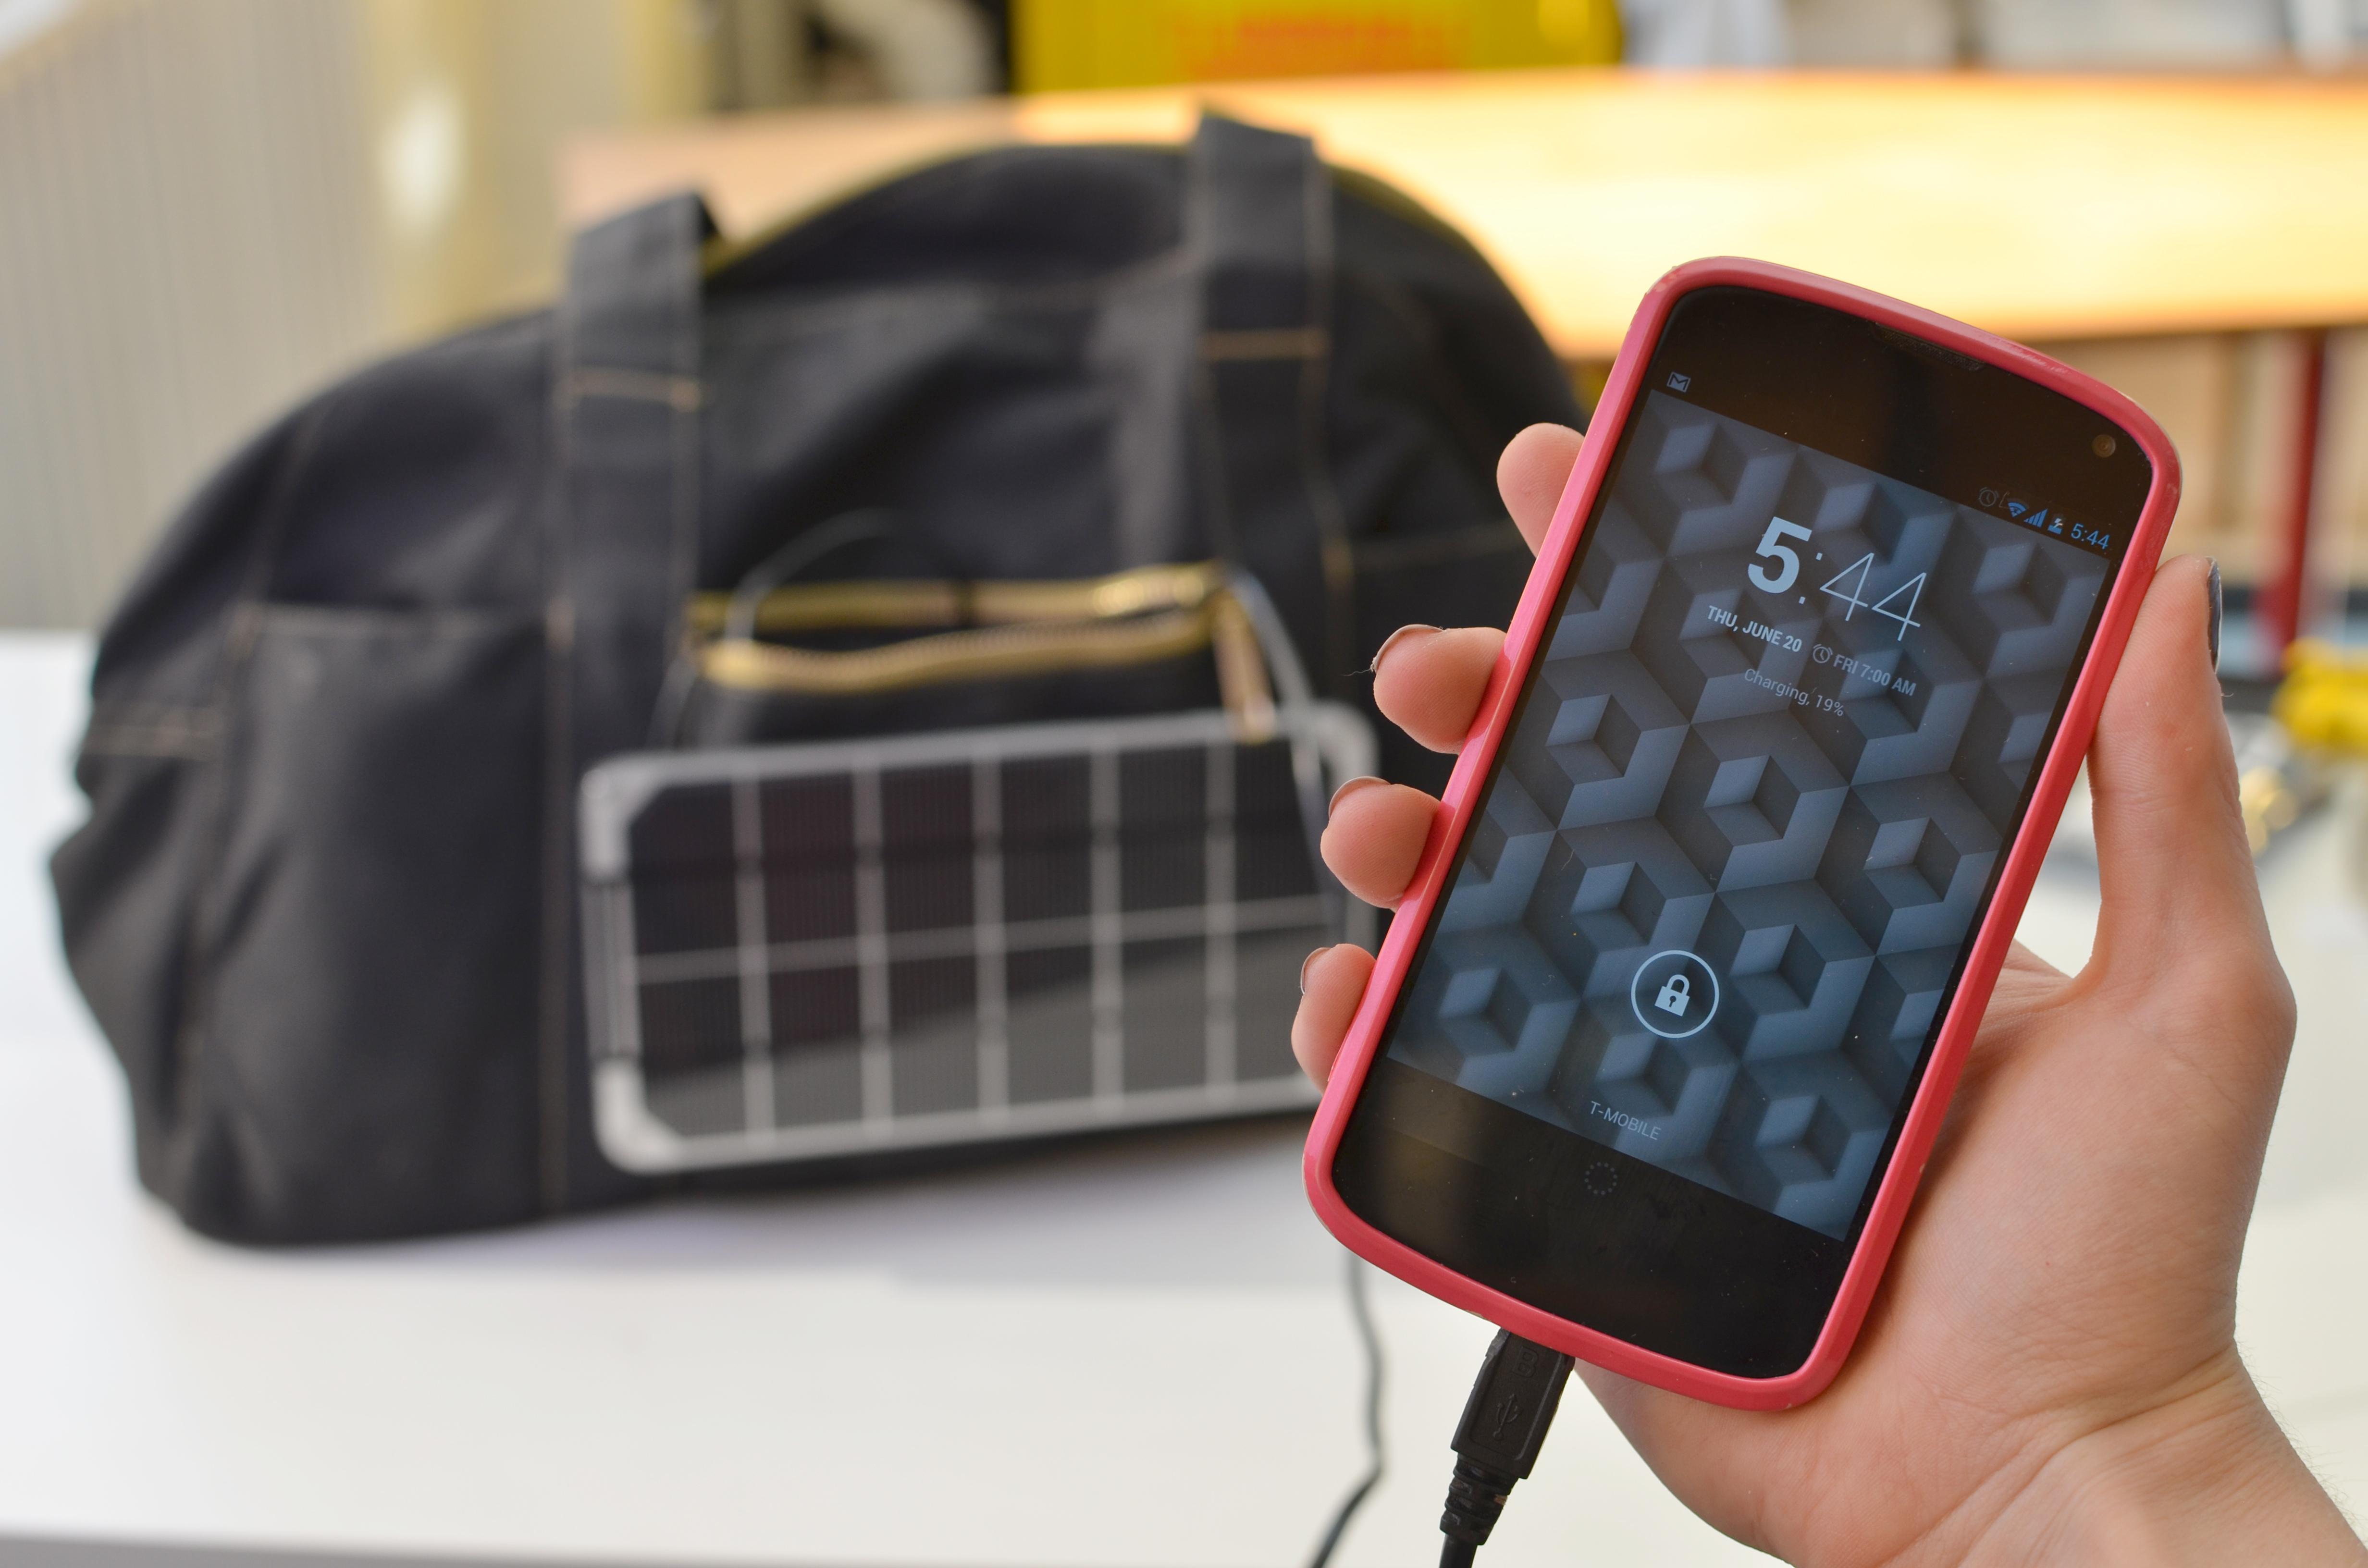 projects_solar-bag-minty-boost-adafruit-15.jpg